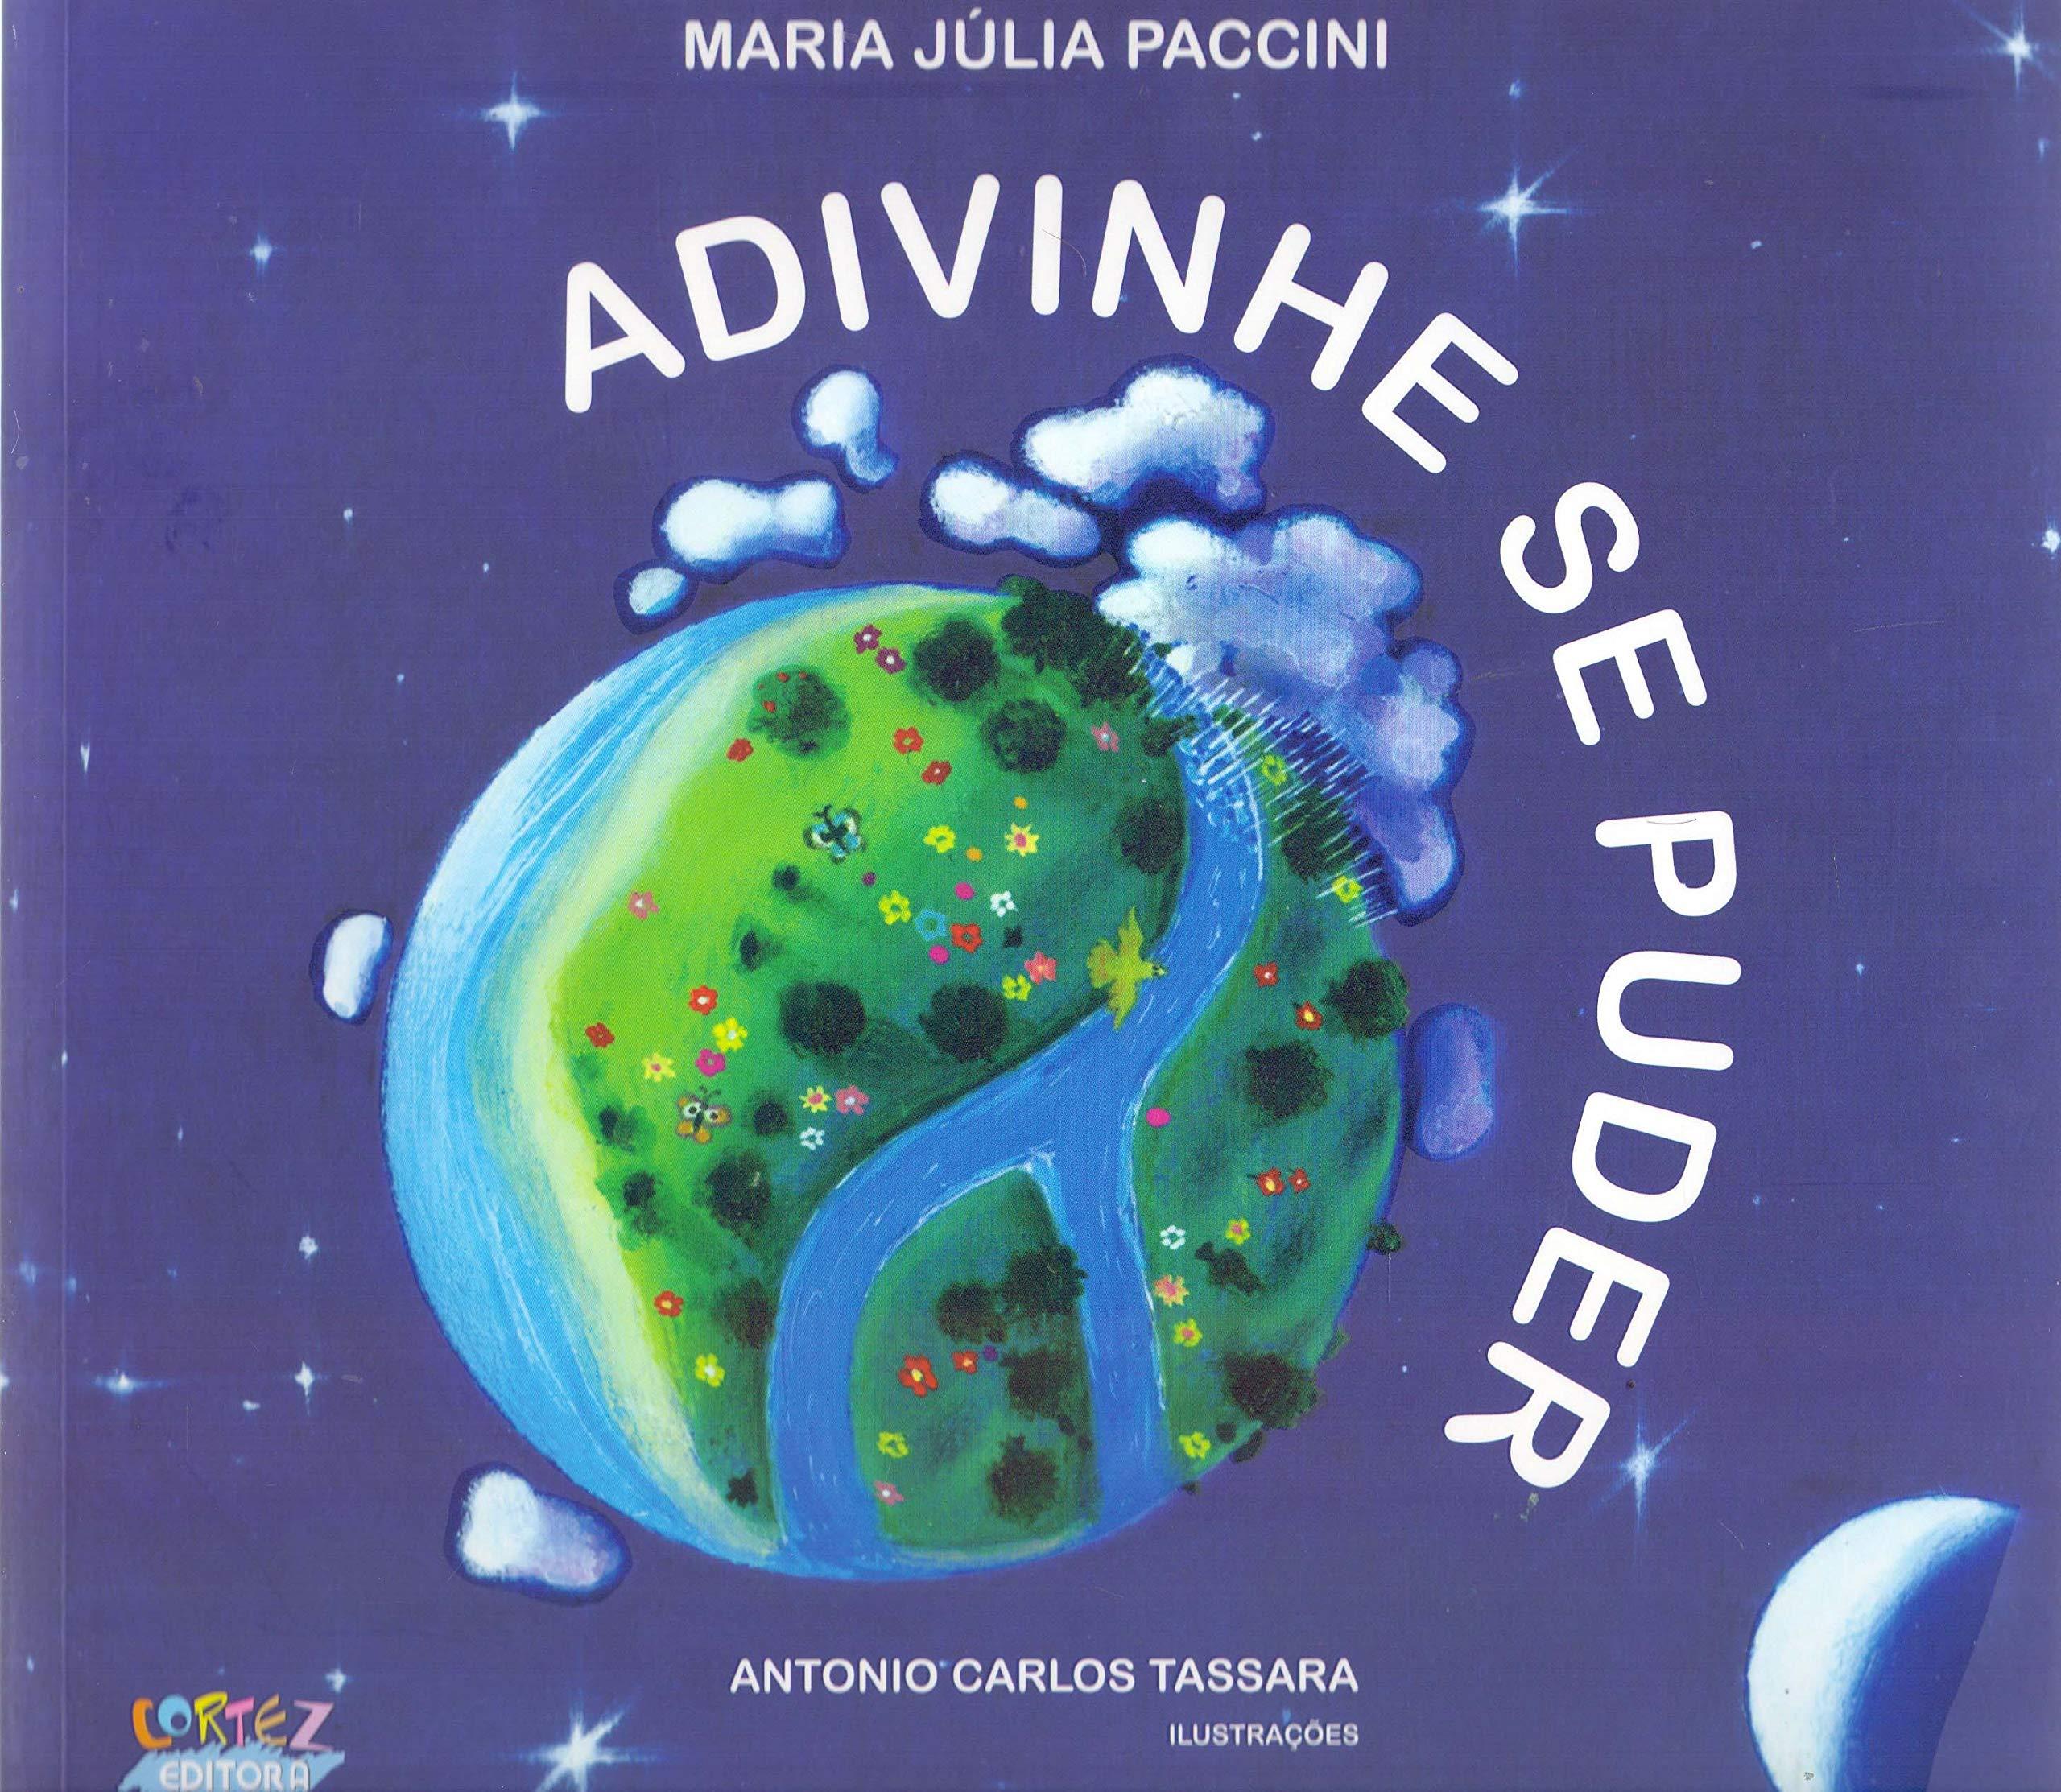 Adivinhe se puder, livro de Maria Júlia Paccini, Antonio Carlos Tassara [ilustrações]